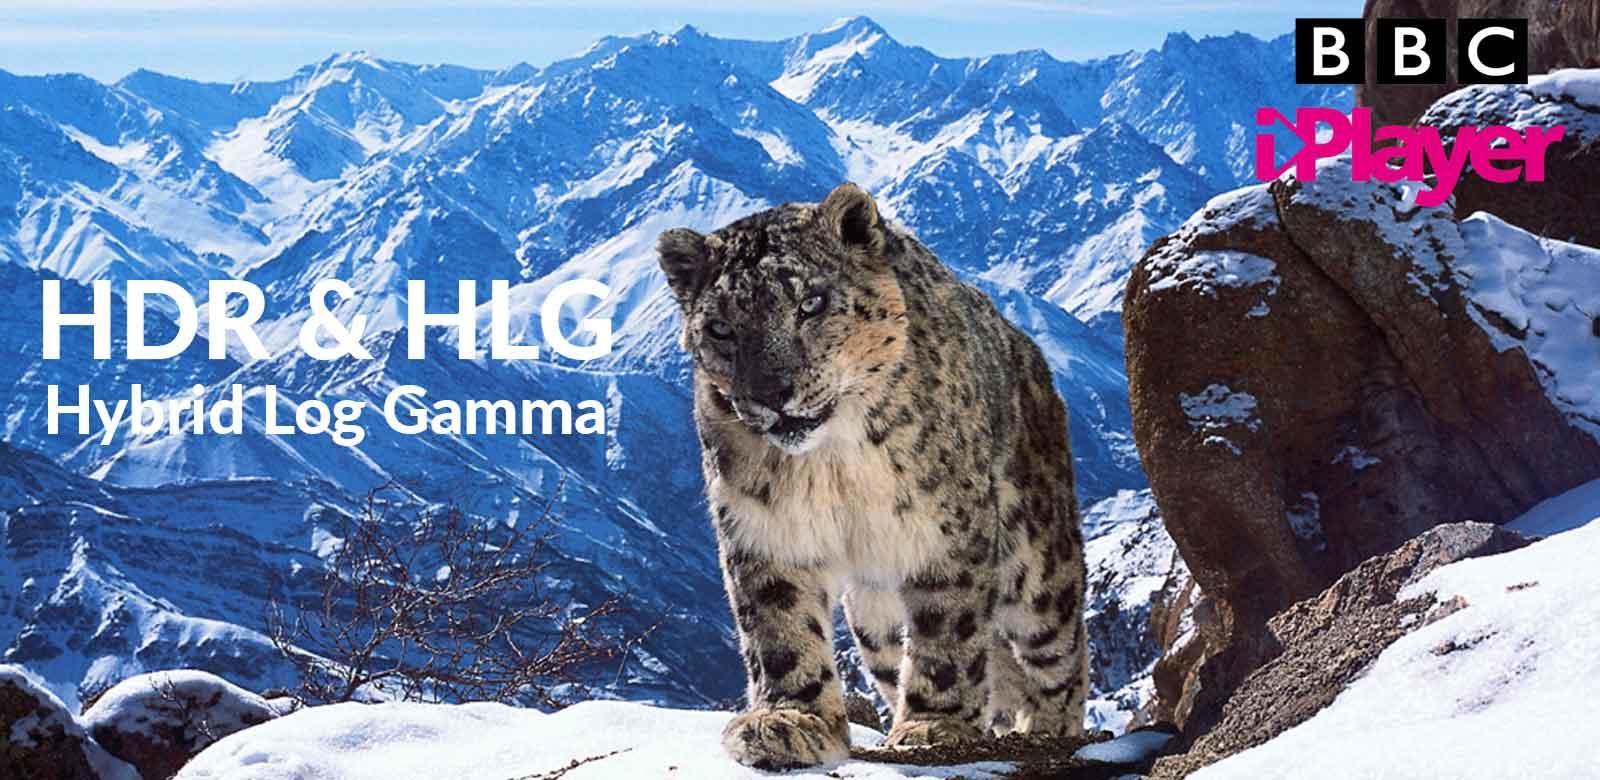 What is HLG Hybrid Log Gamma?